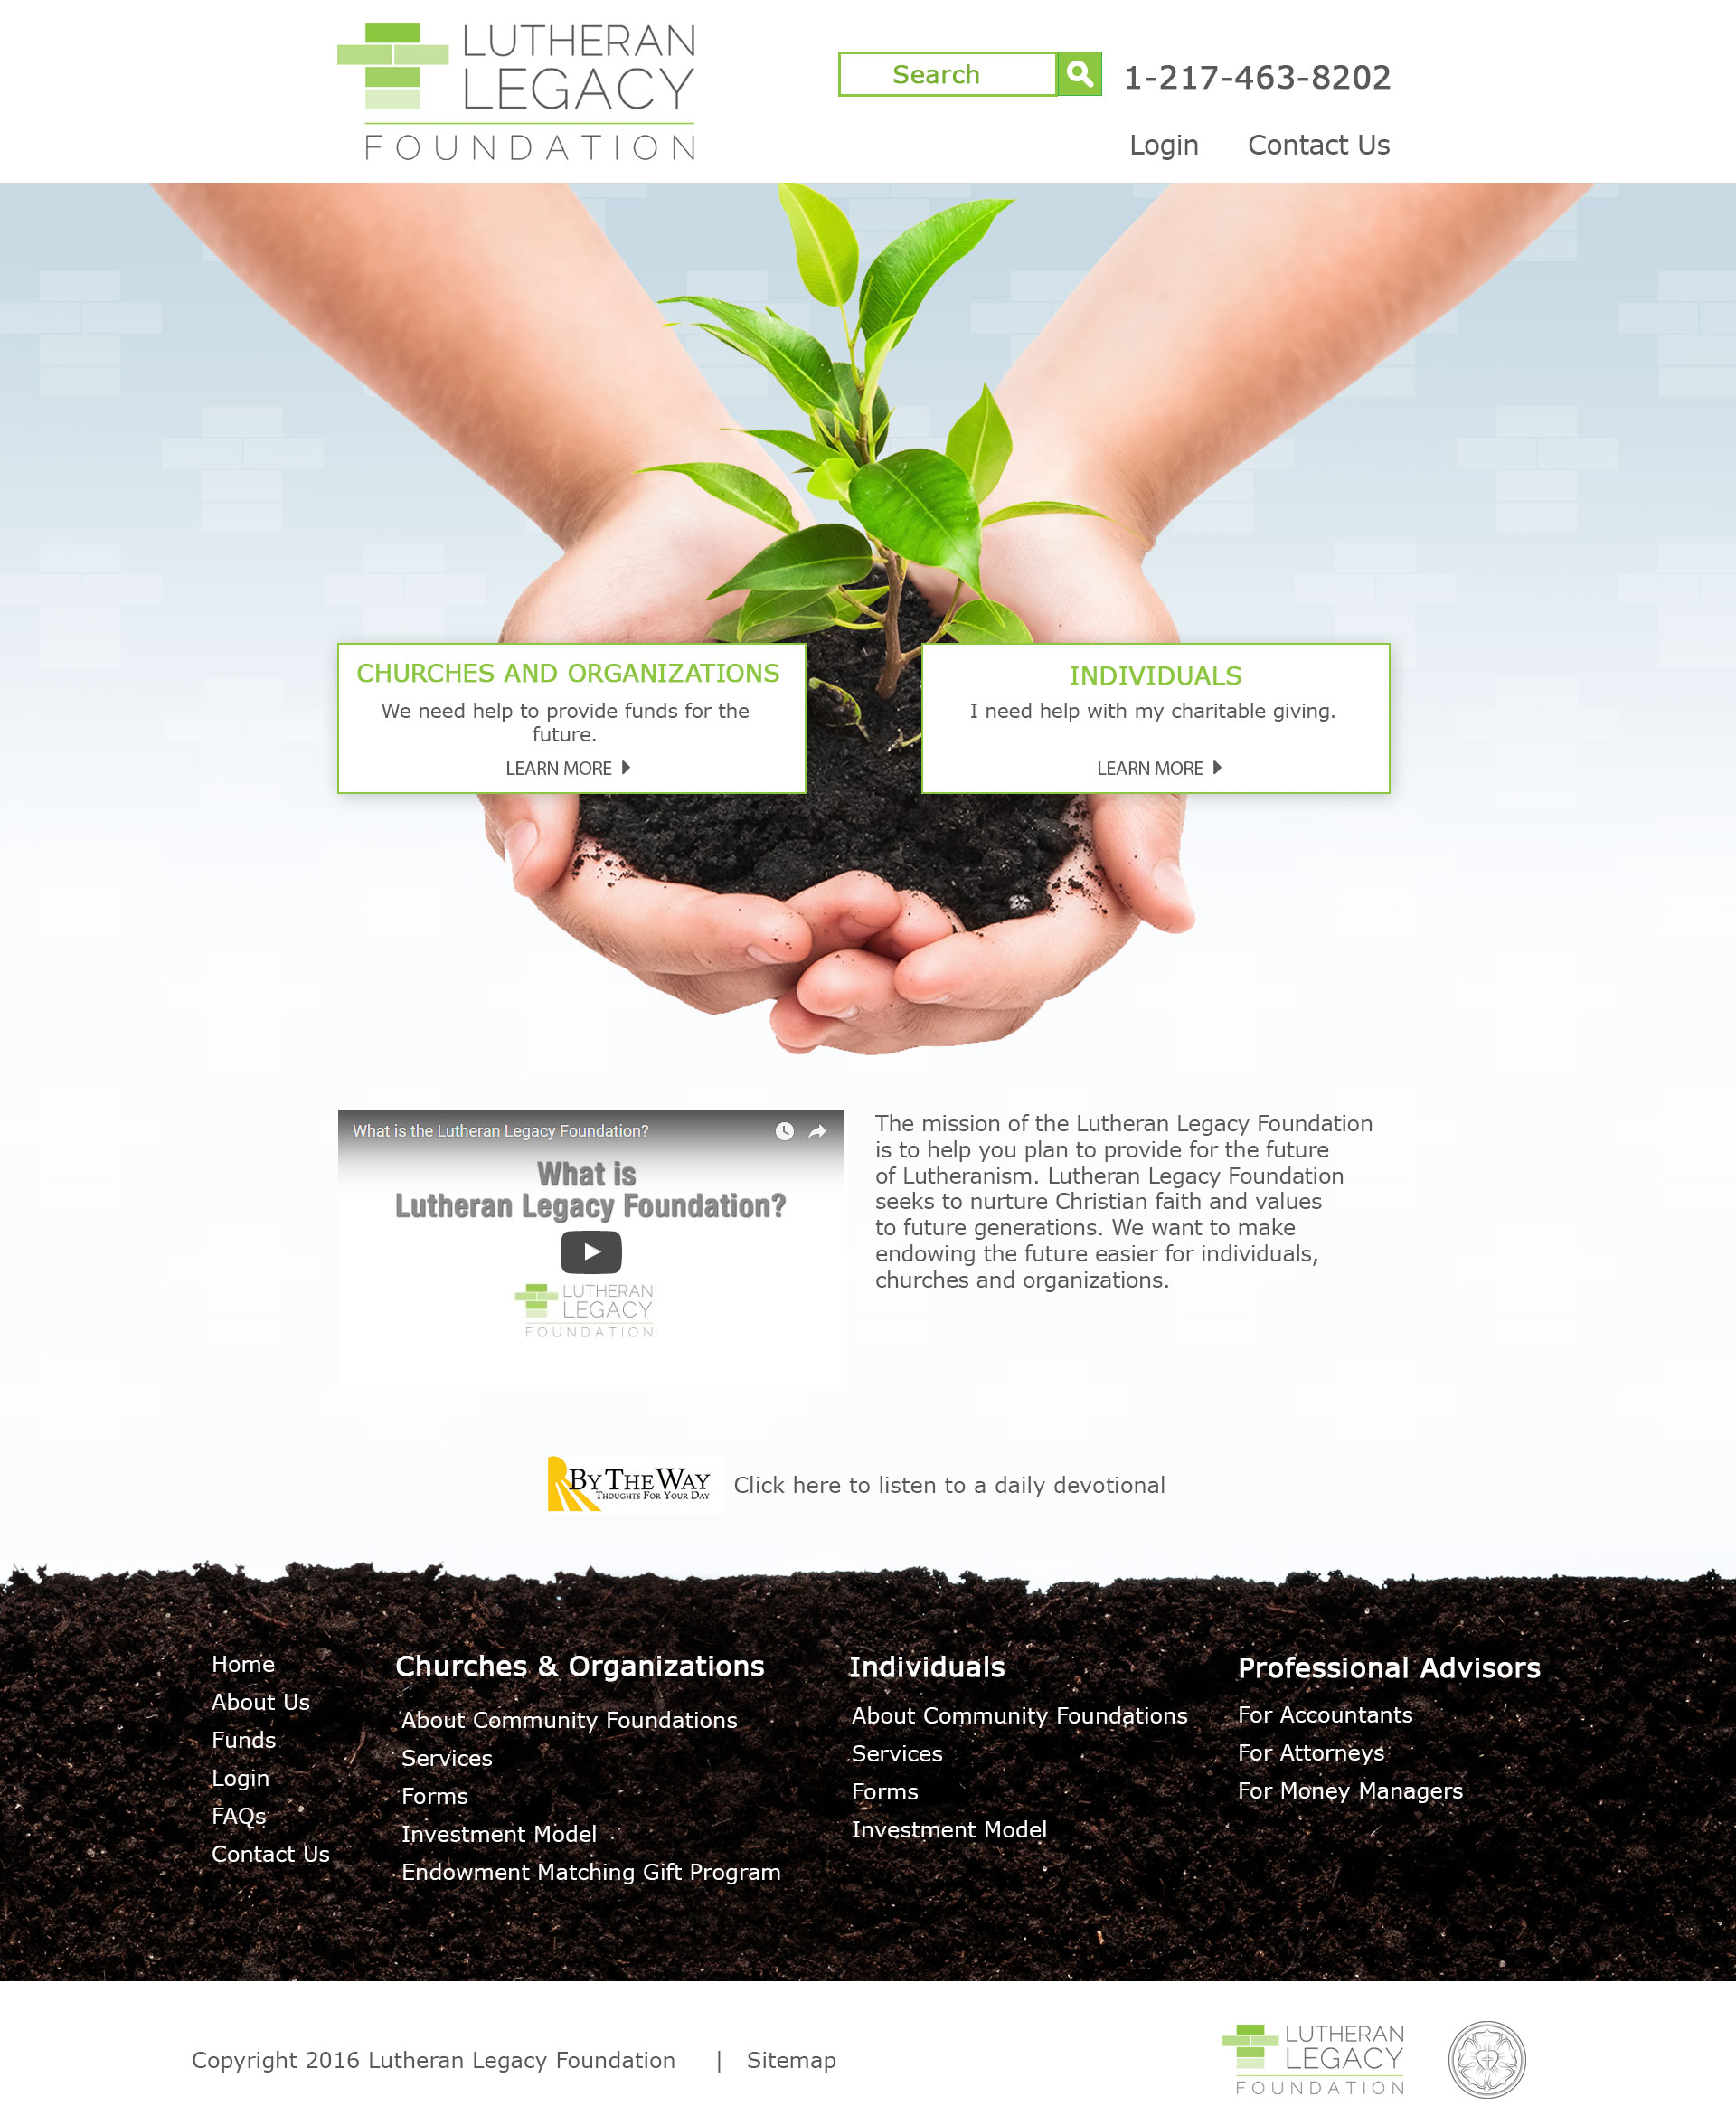 Lutheran Legacy Foundation Landing Page